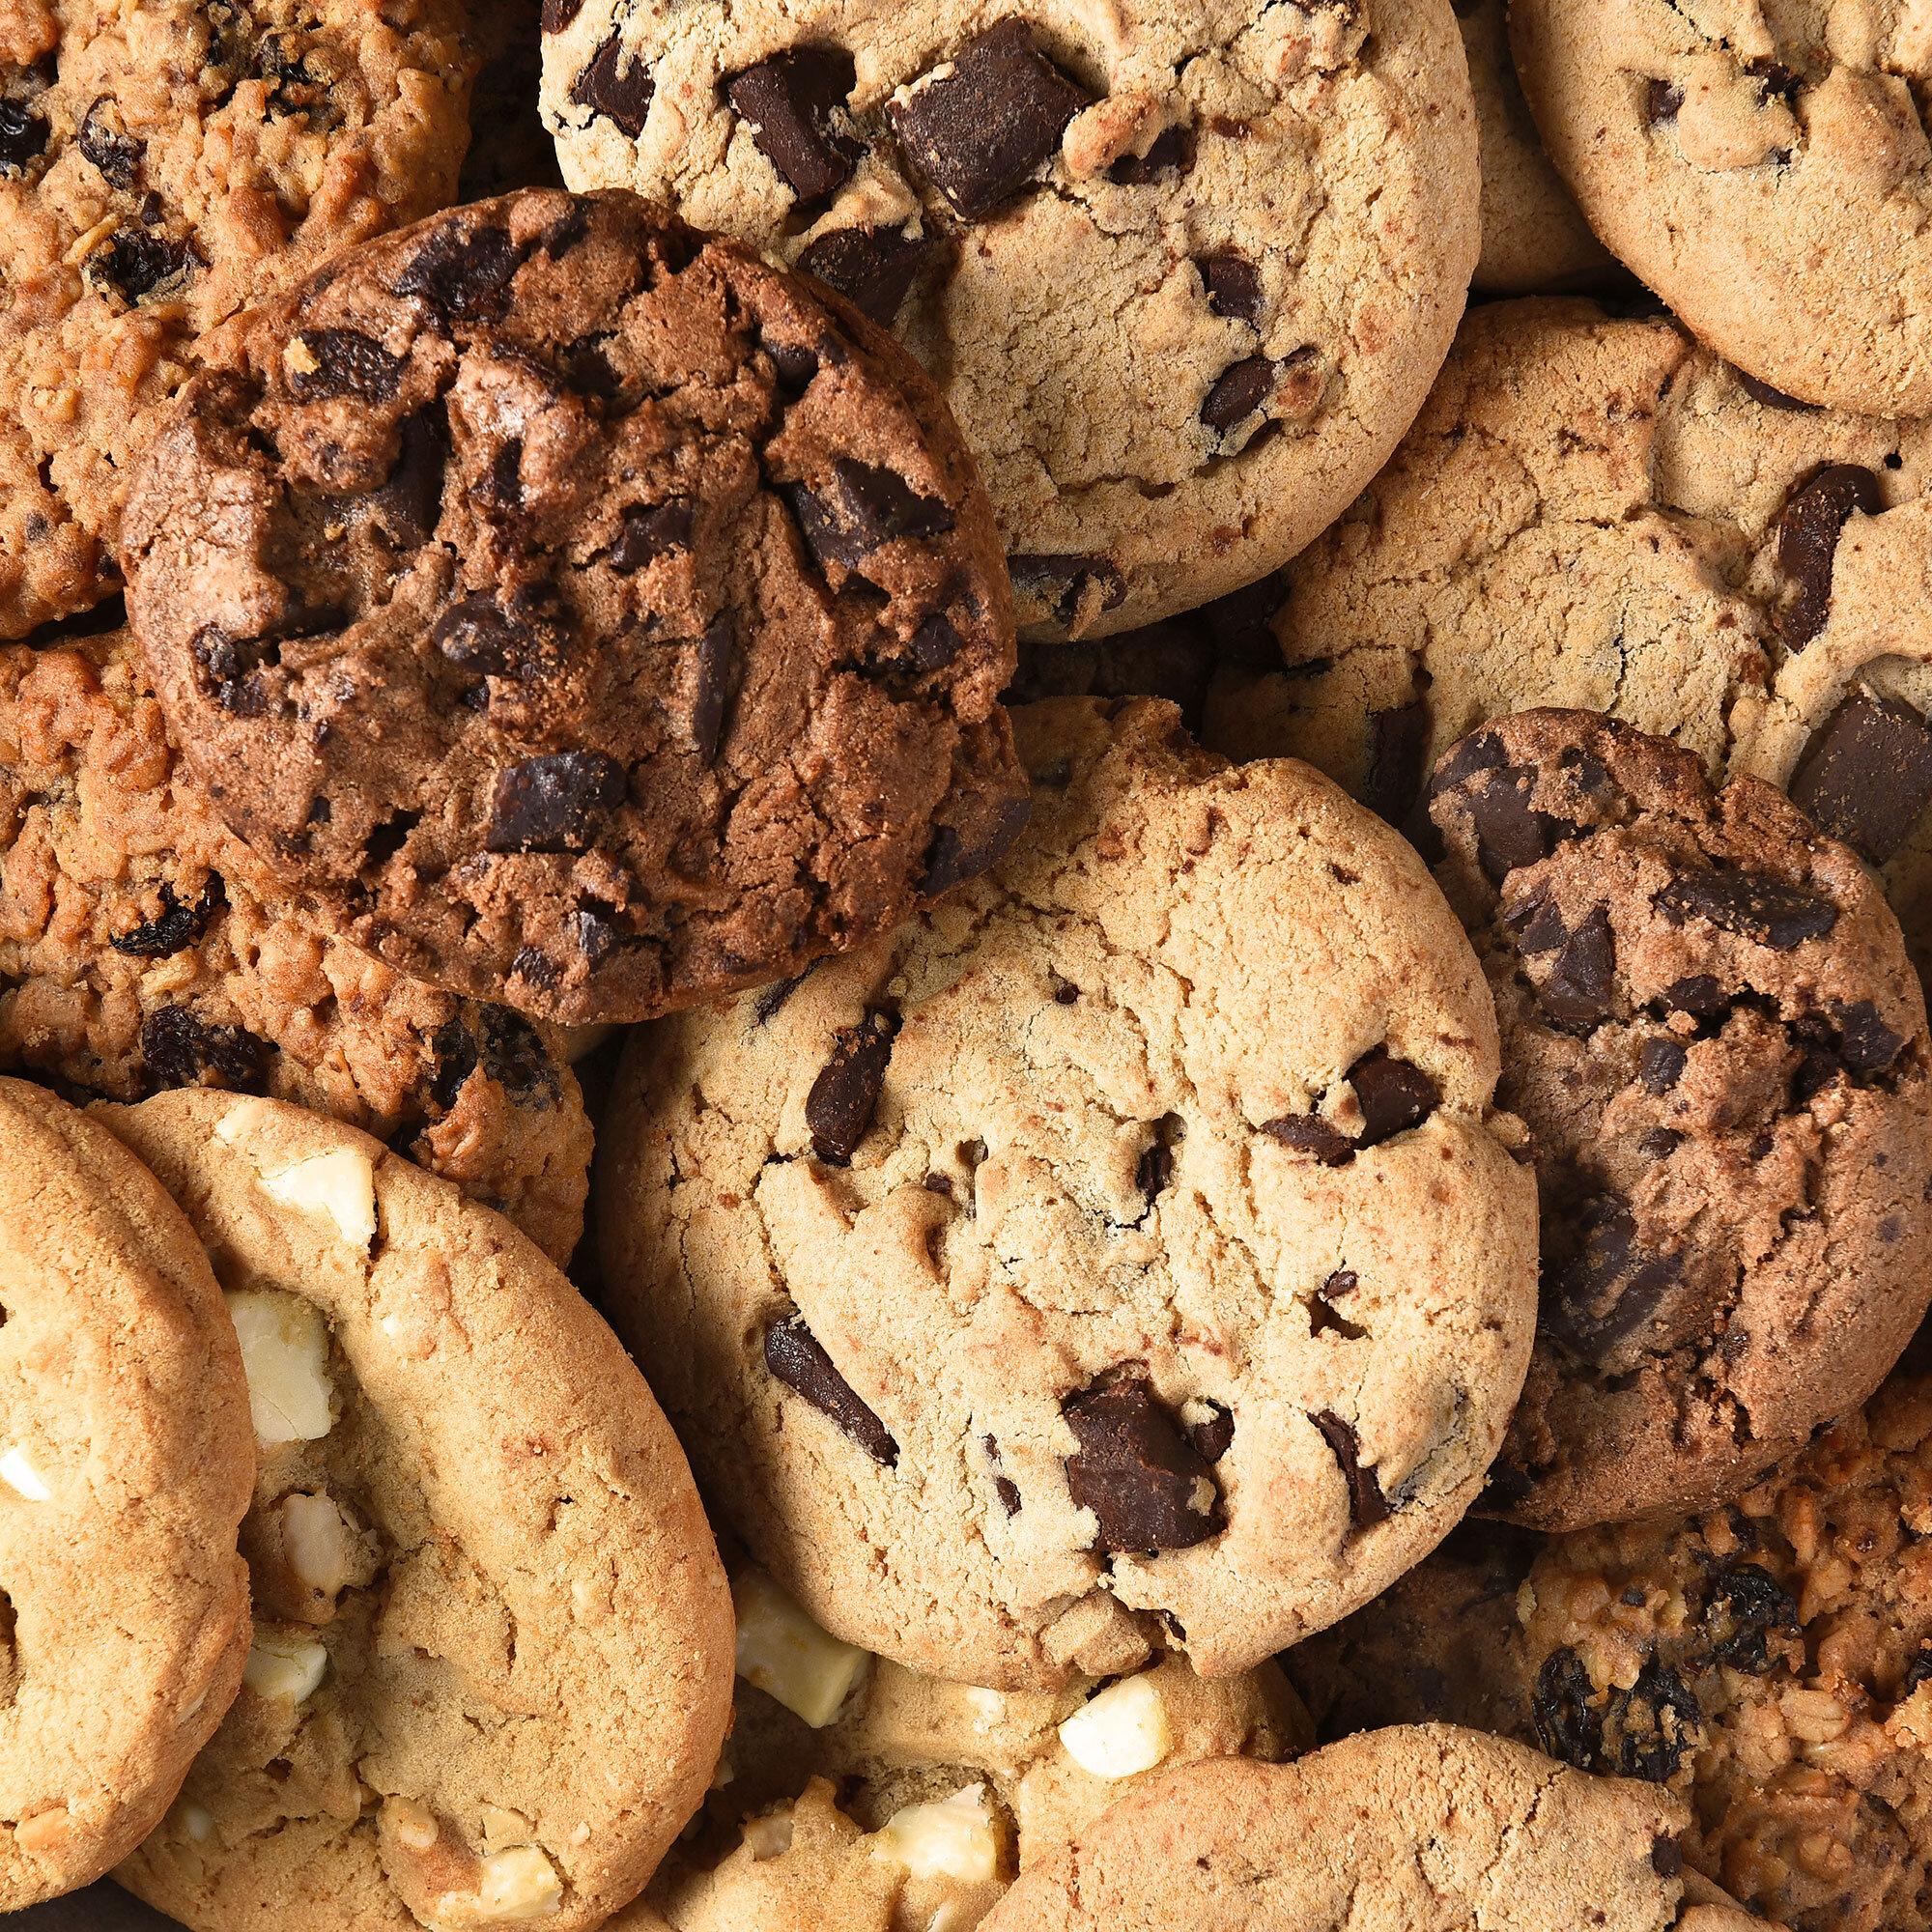 https://www.shirtstore.se/pub_docs/files/Cookies/CookiesShirtstore.jpg